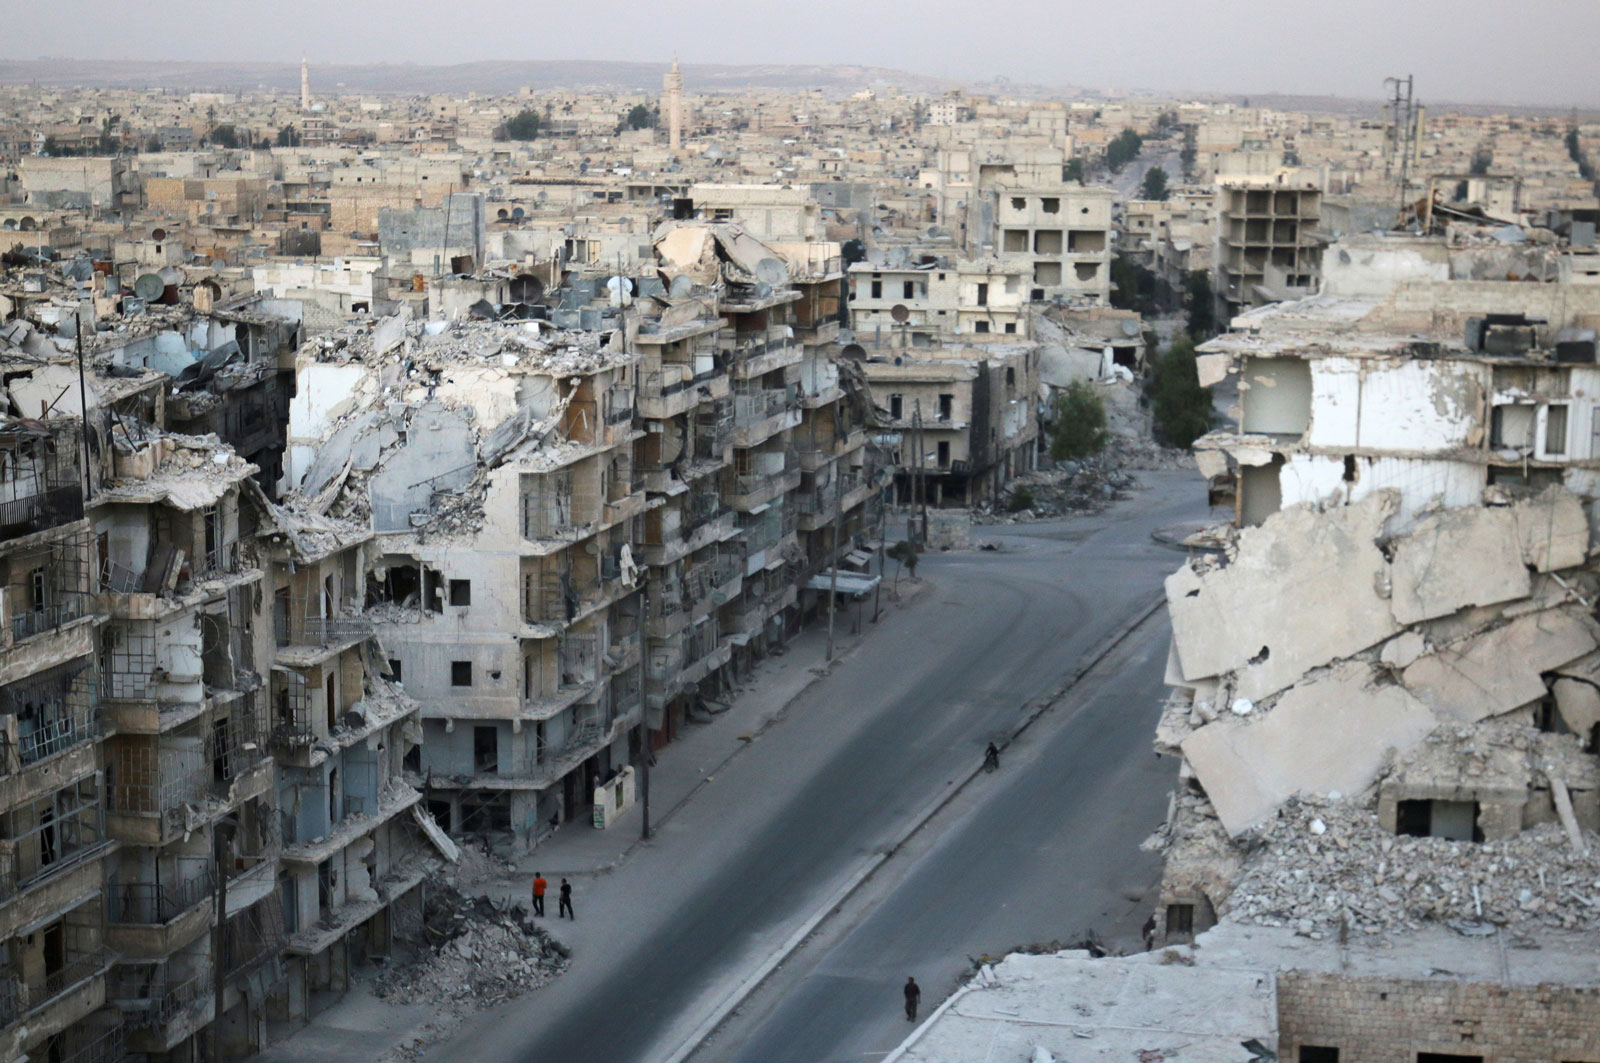 Aleppo, Syria, October 5, 2016